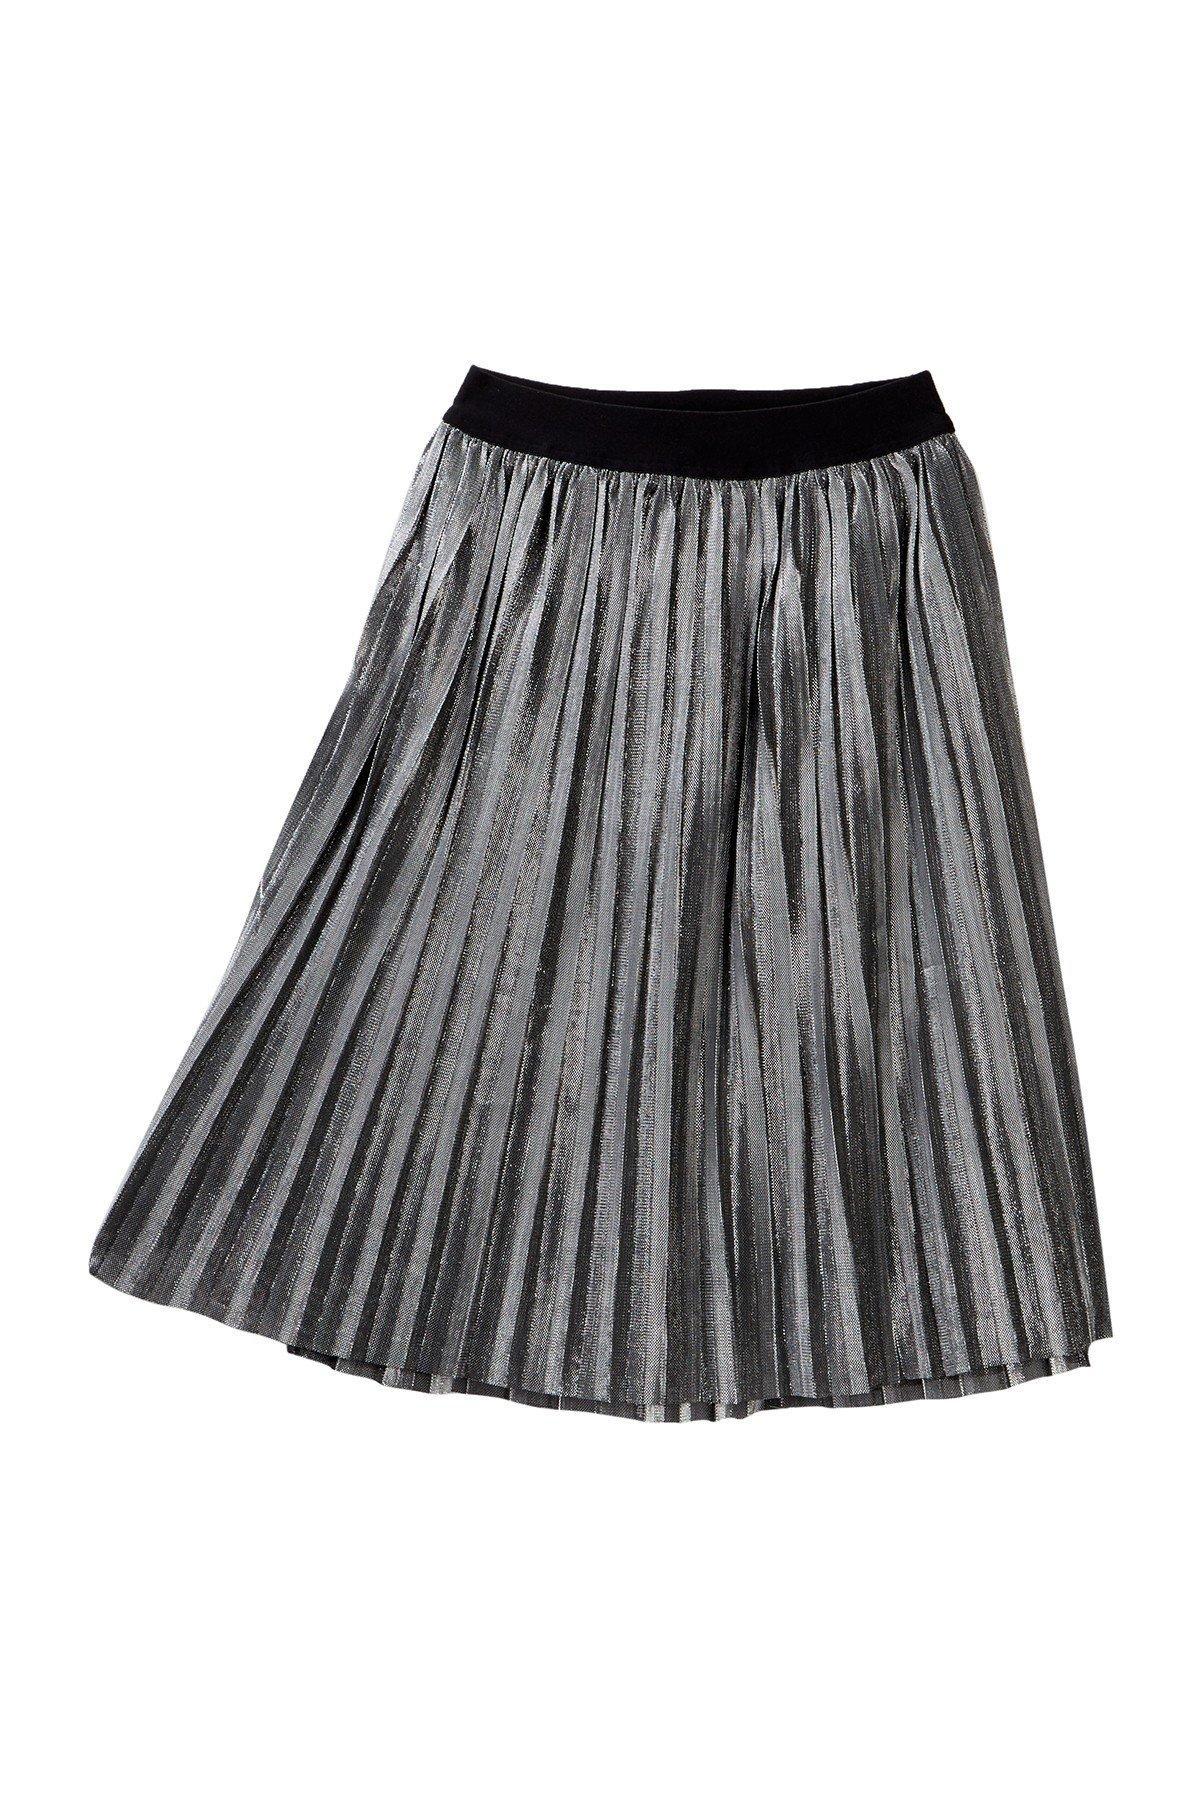 love, FiRE Black Girls Large Pleated Metallic Skirt Silver L